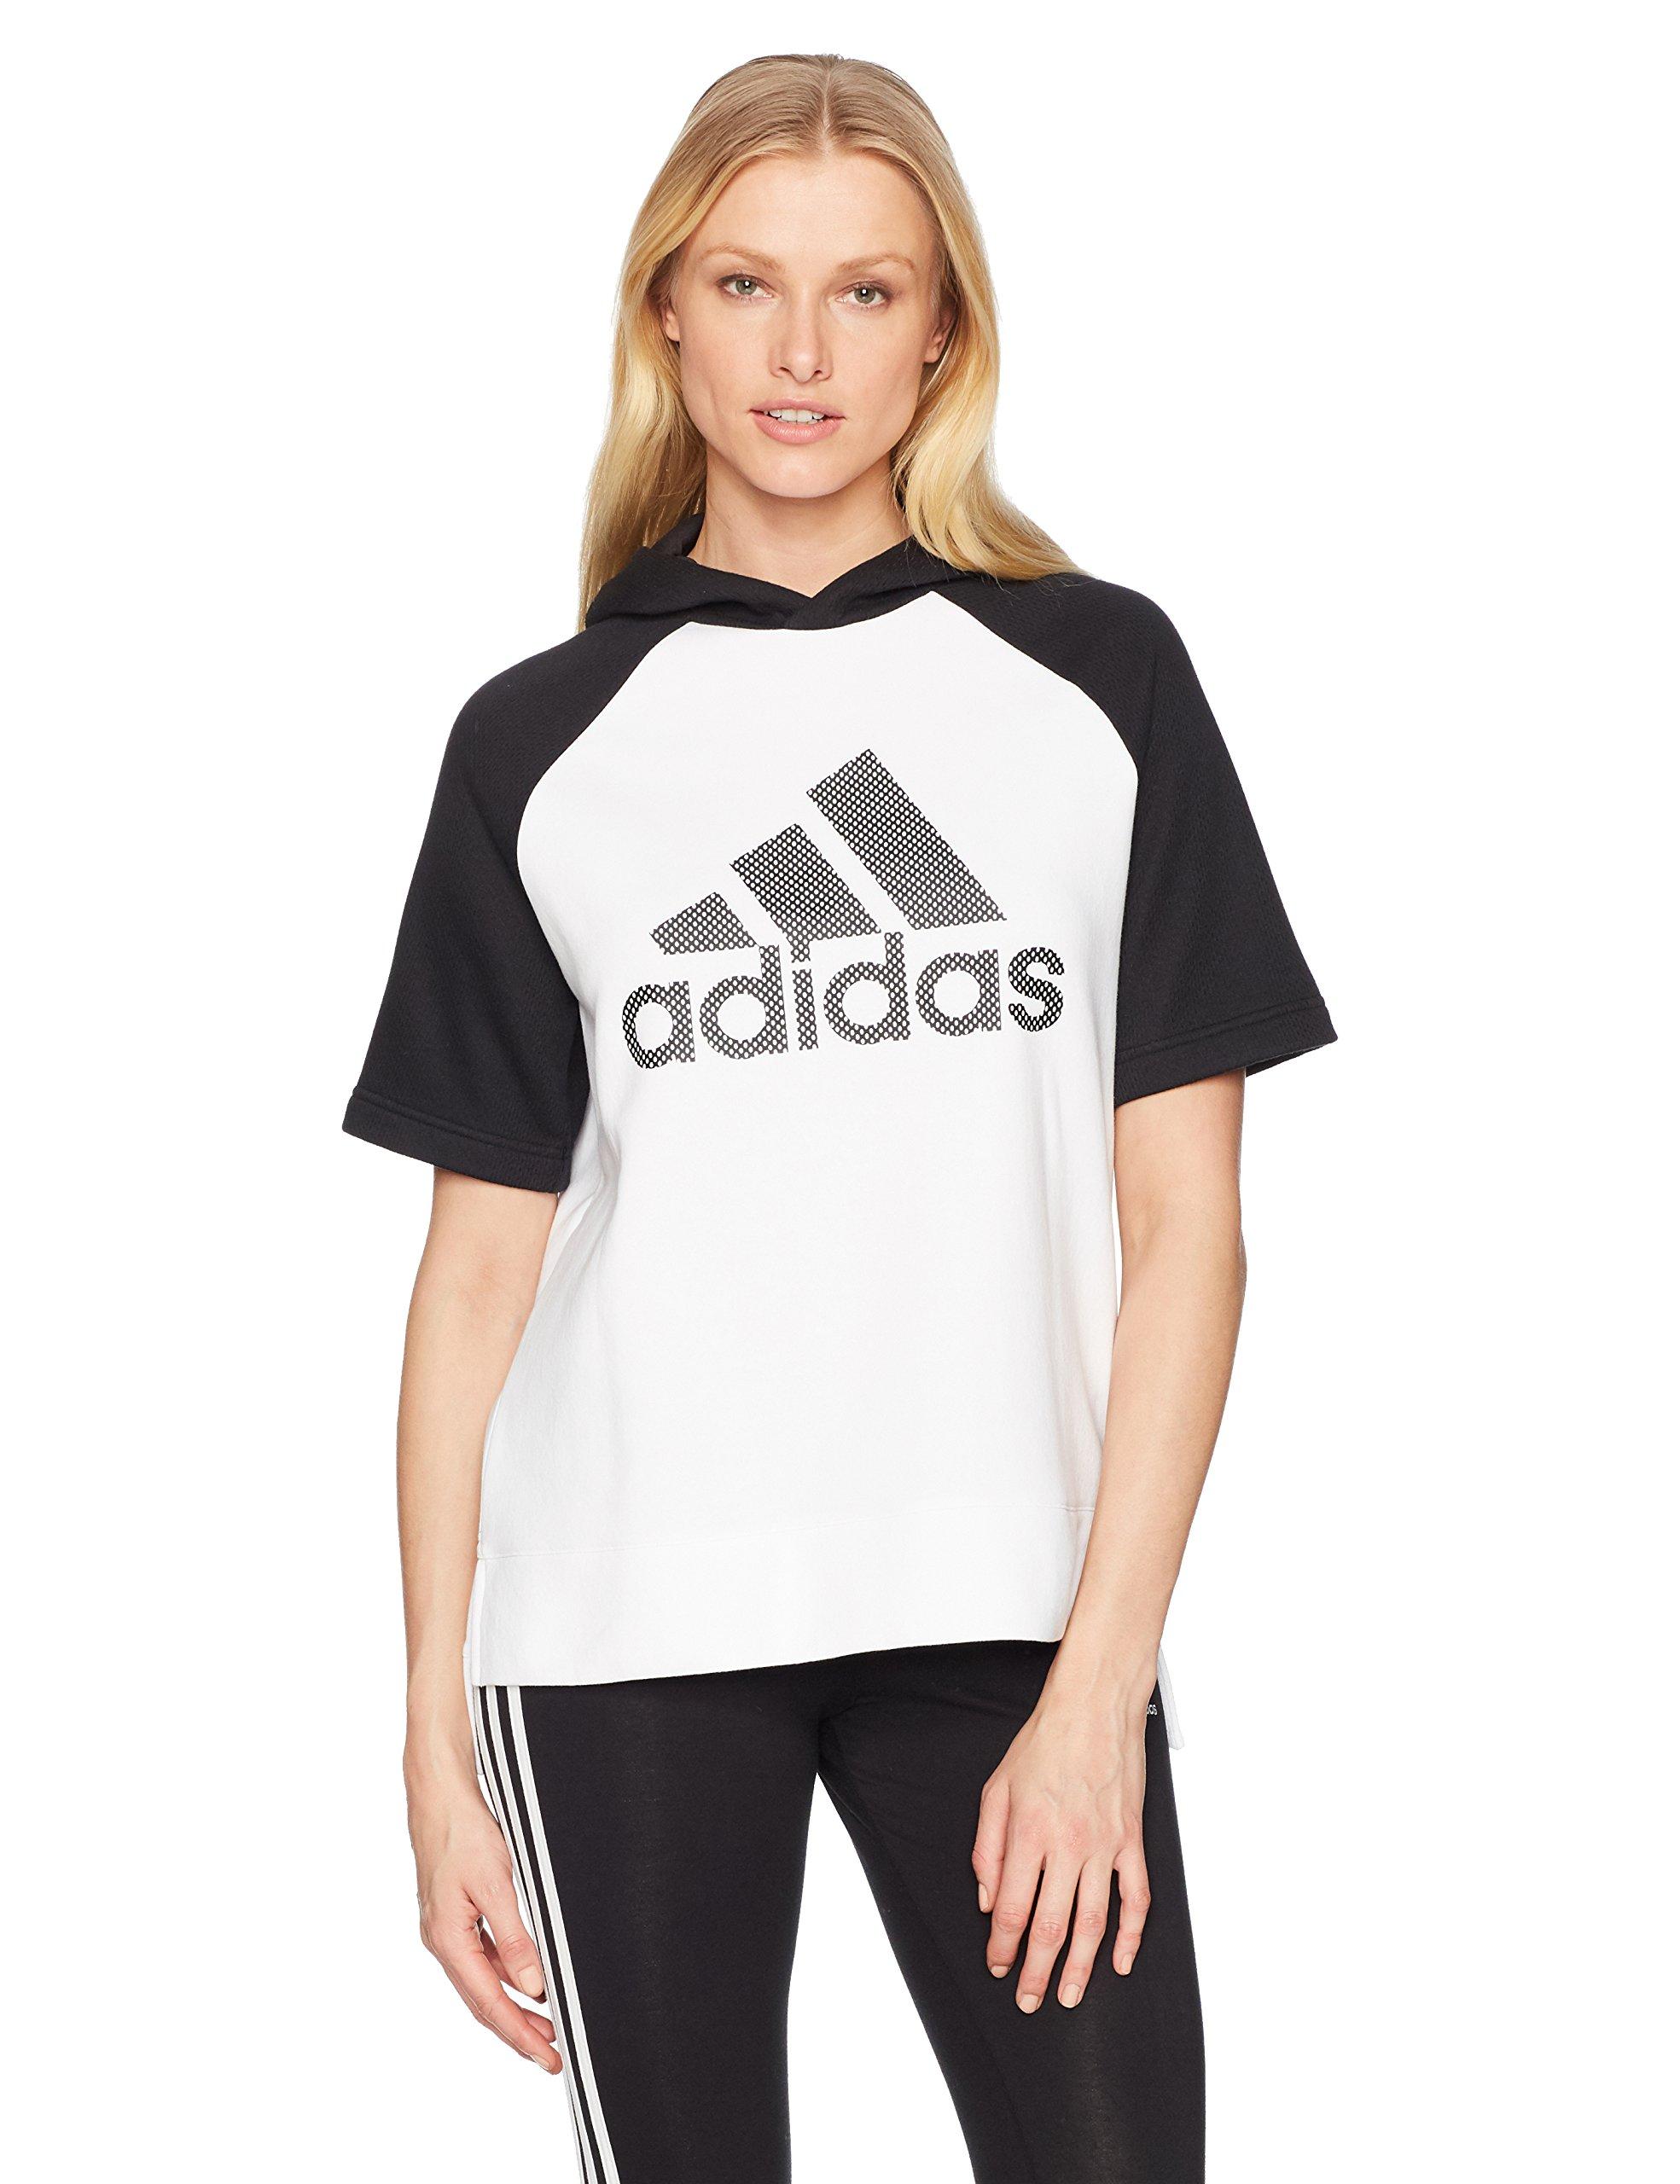 adidas Womens Athletics Fashion Full Zip Short sleeve Hoody, White/Black/Black, Small